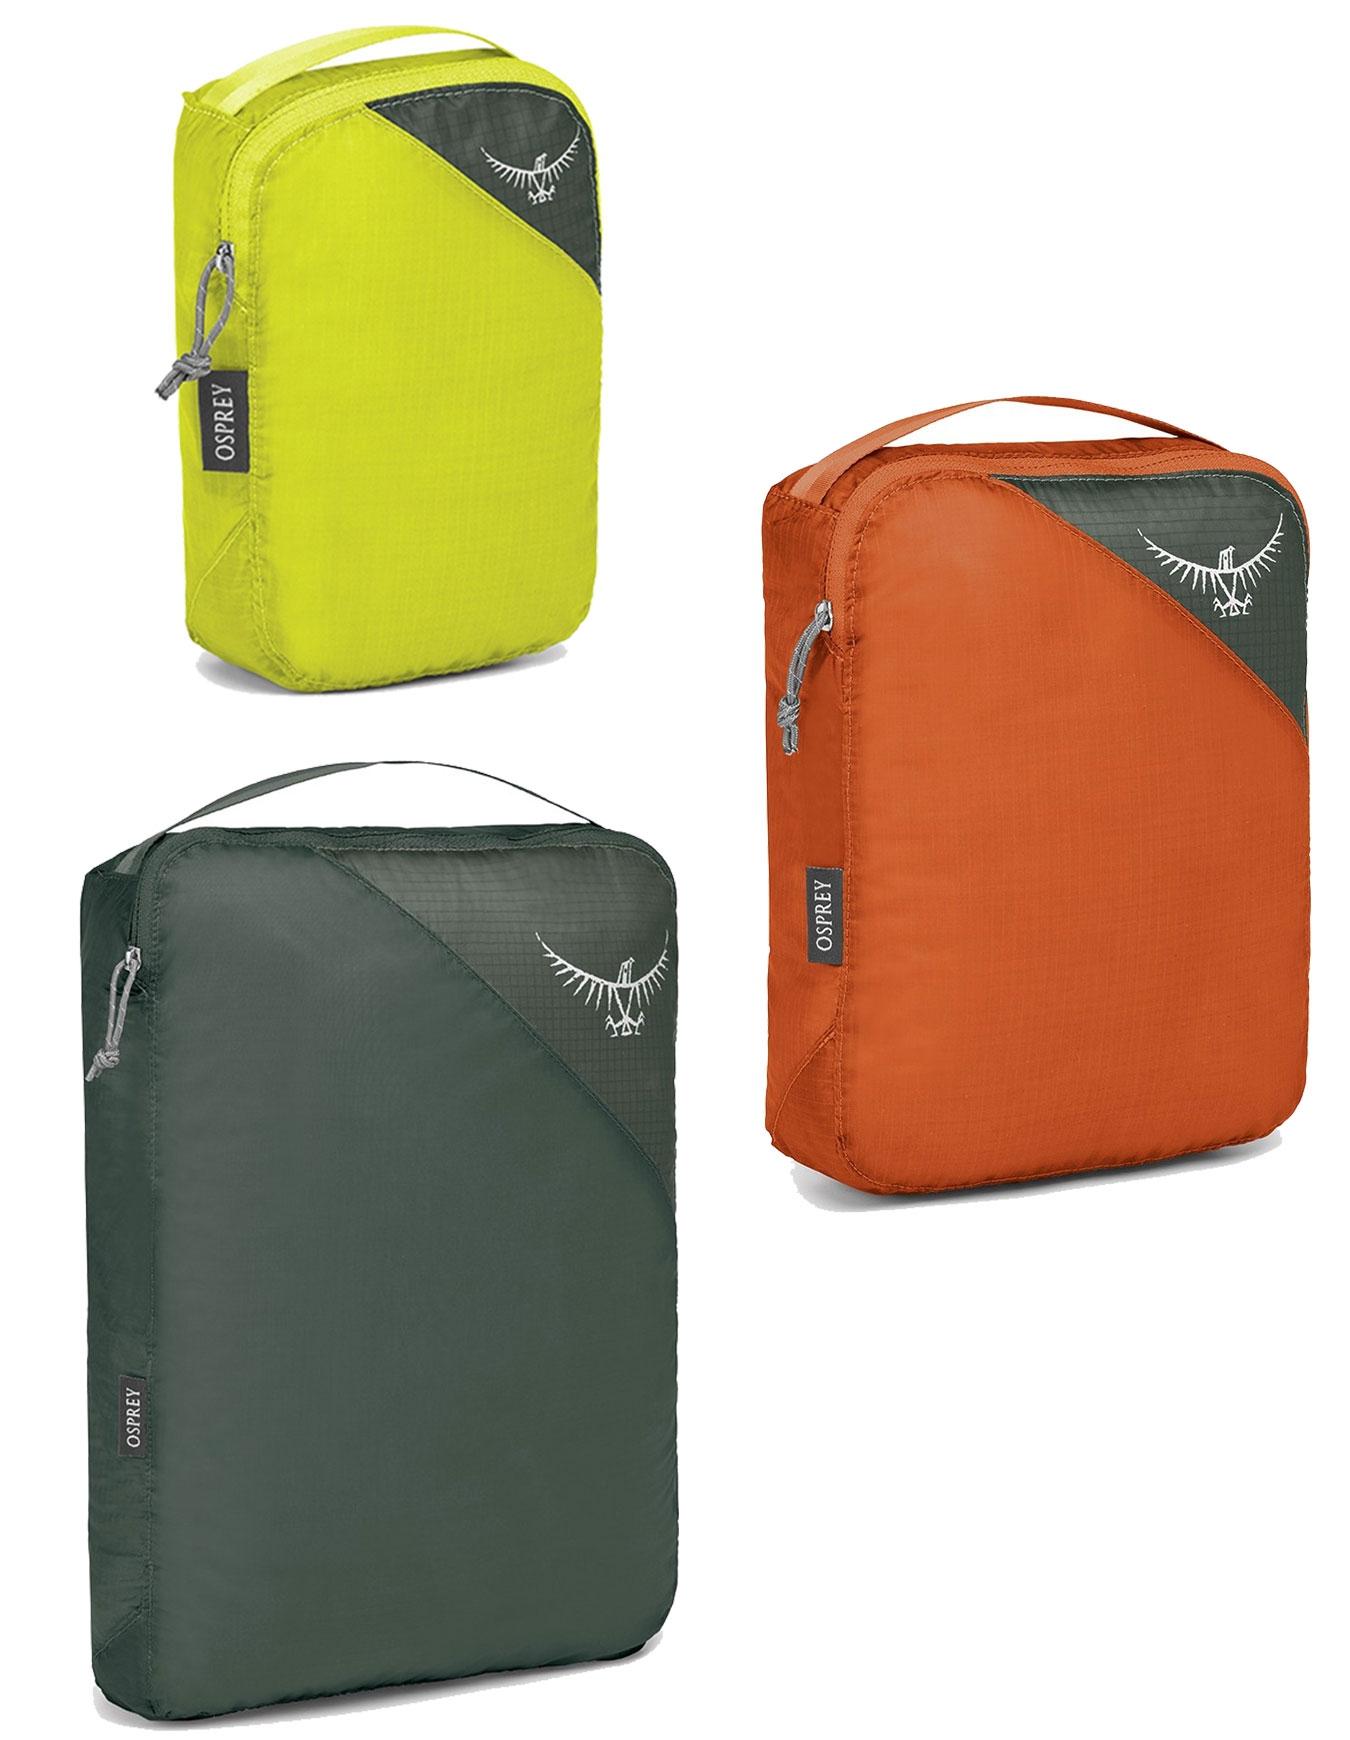 Osprey Ultralight Pack Cube